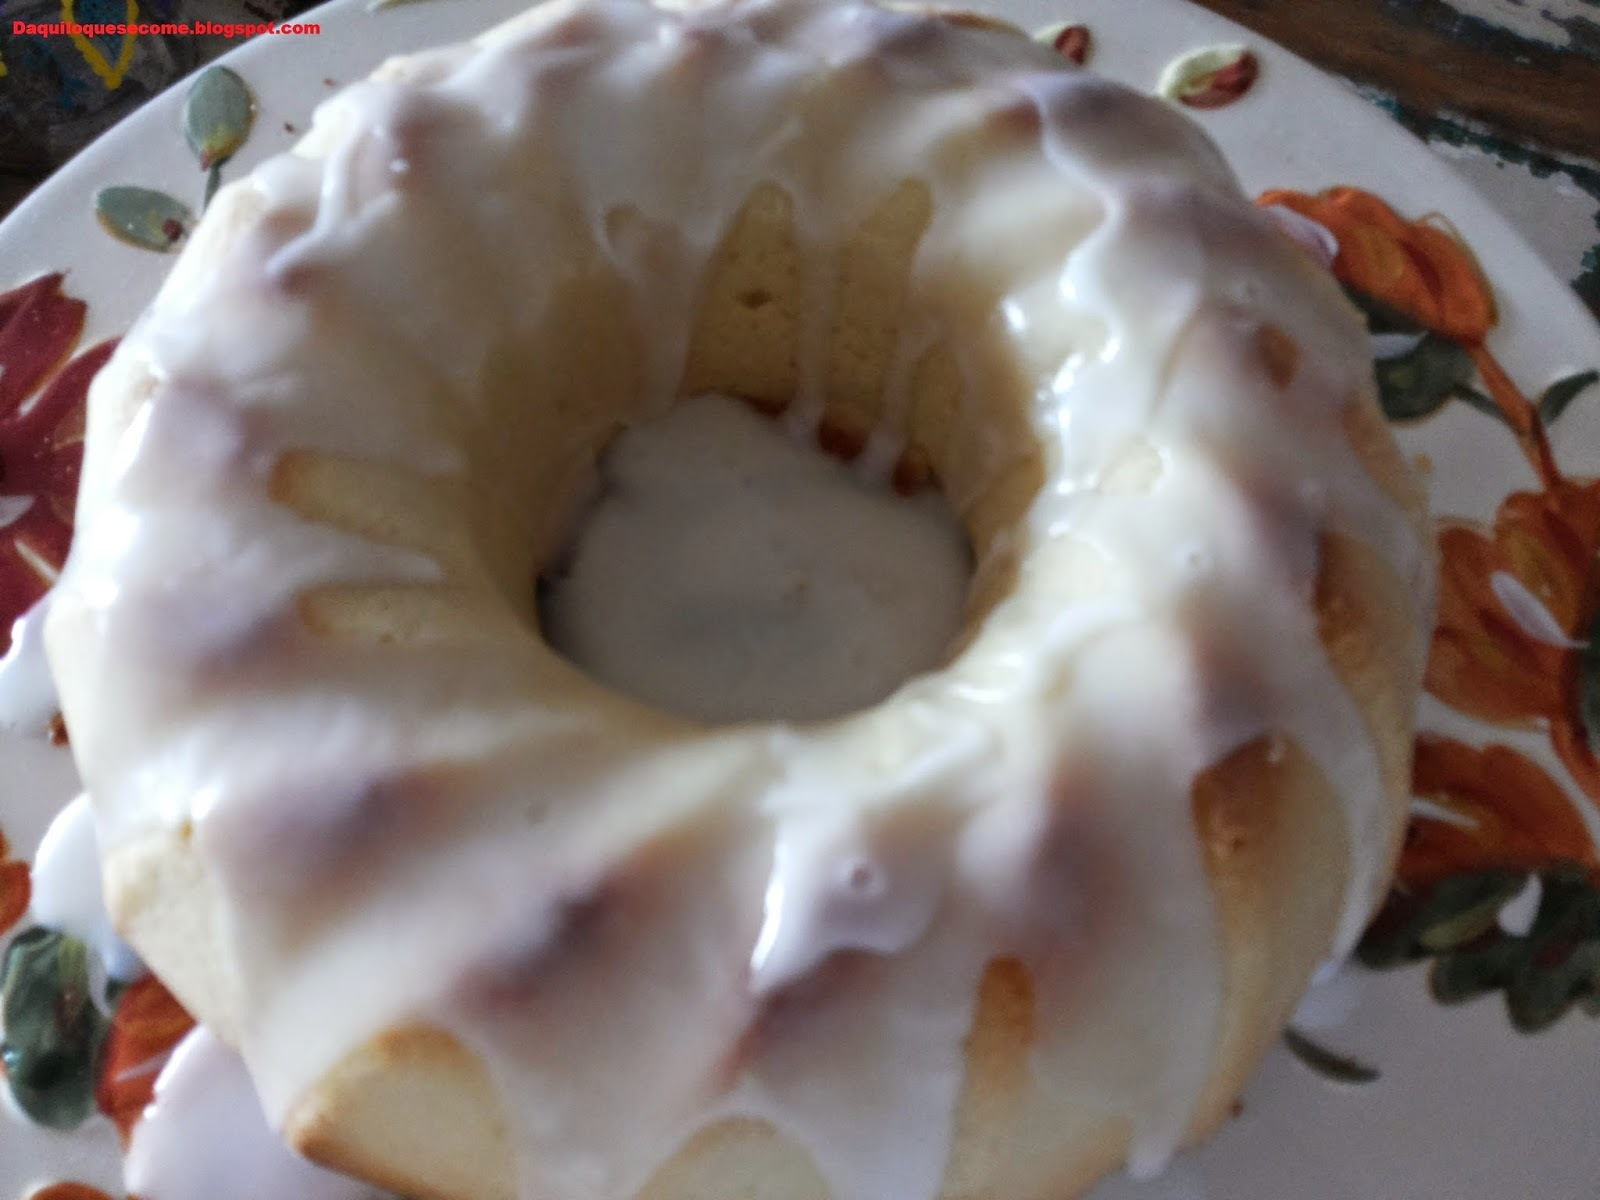 de bolo de manteiga grande e fofo